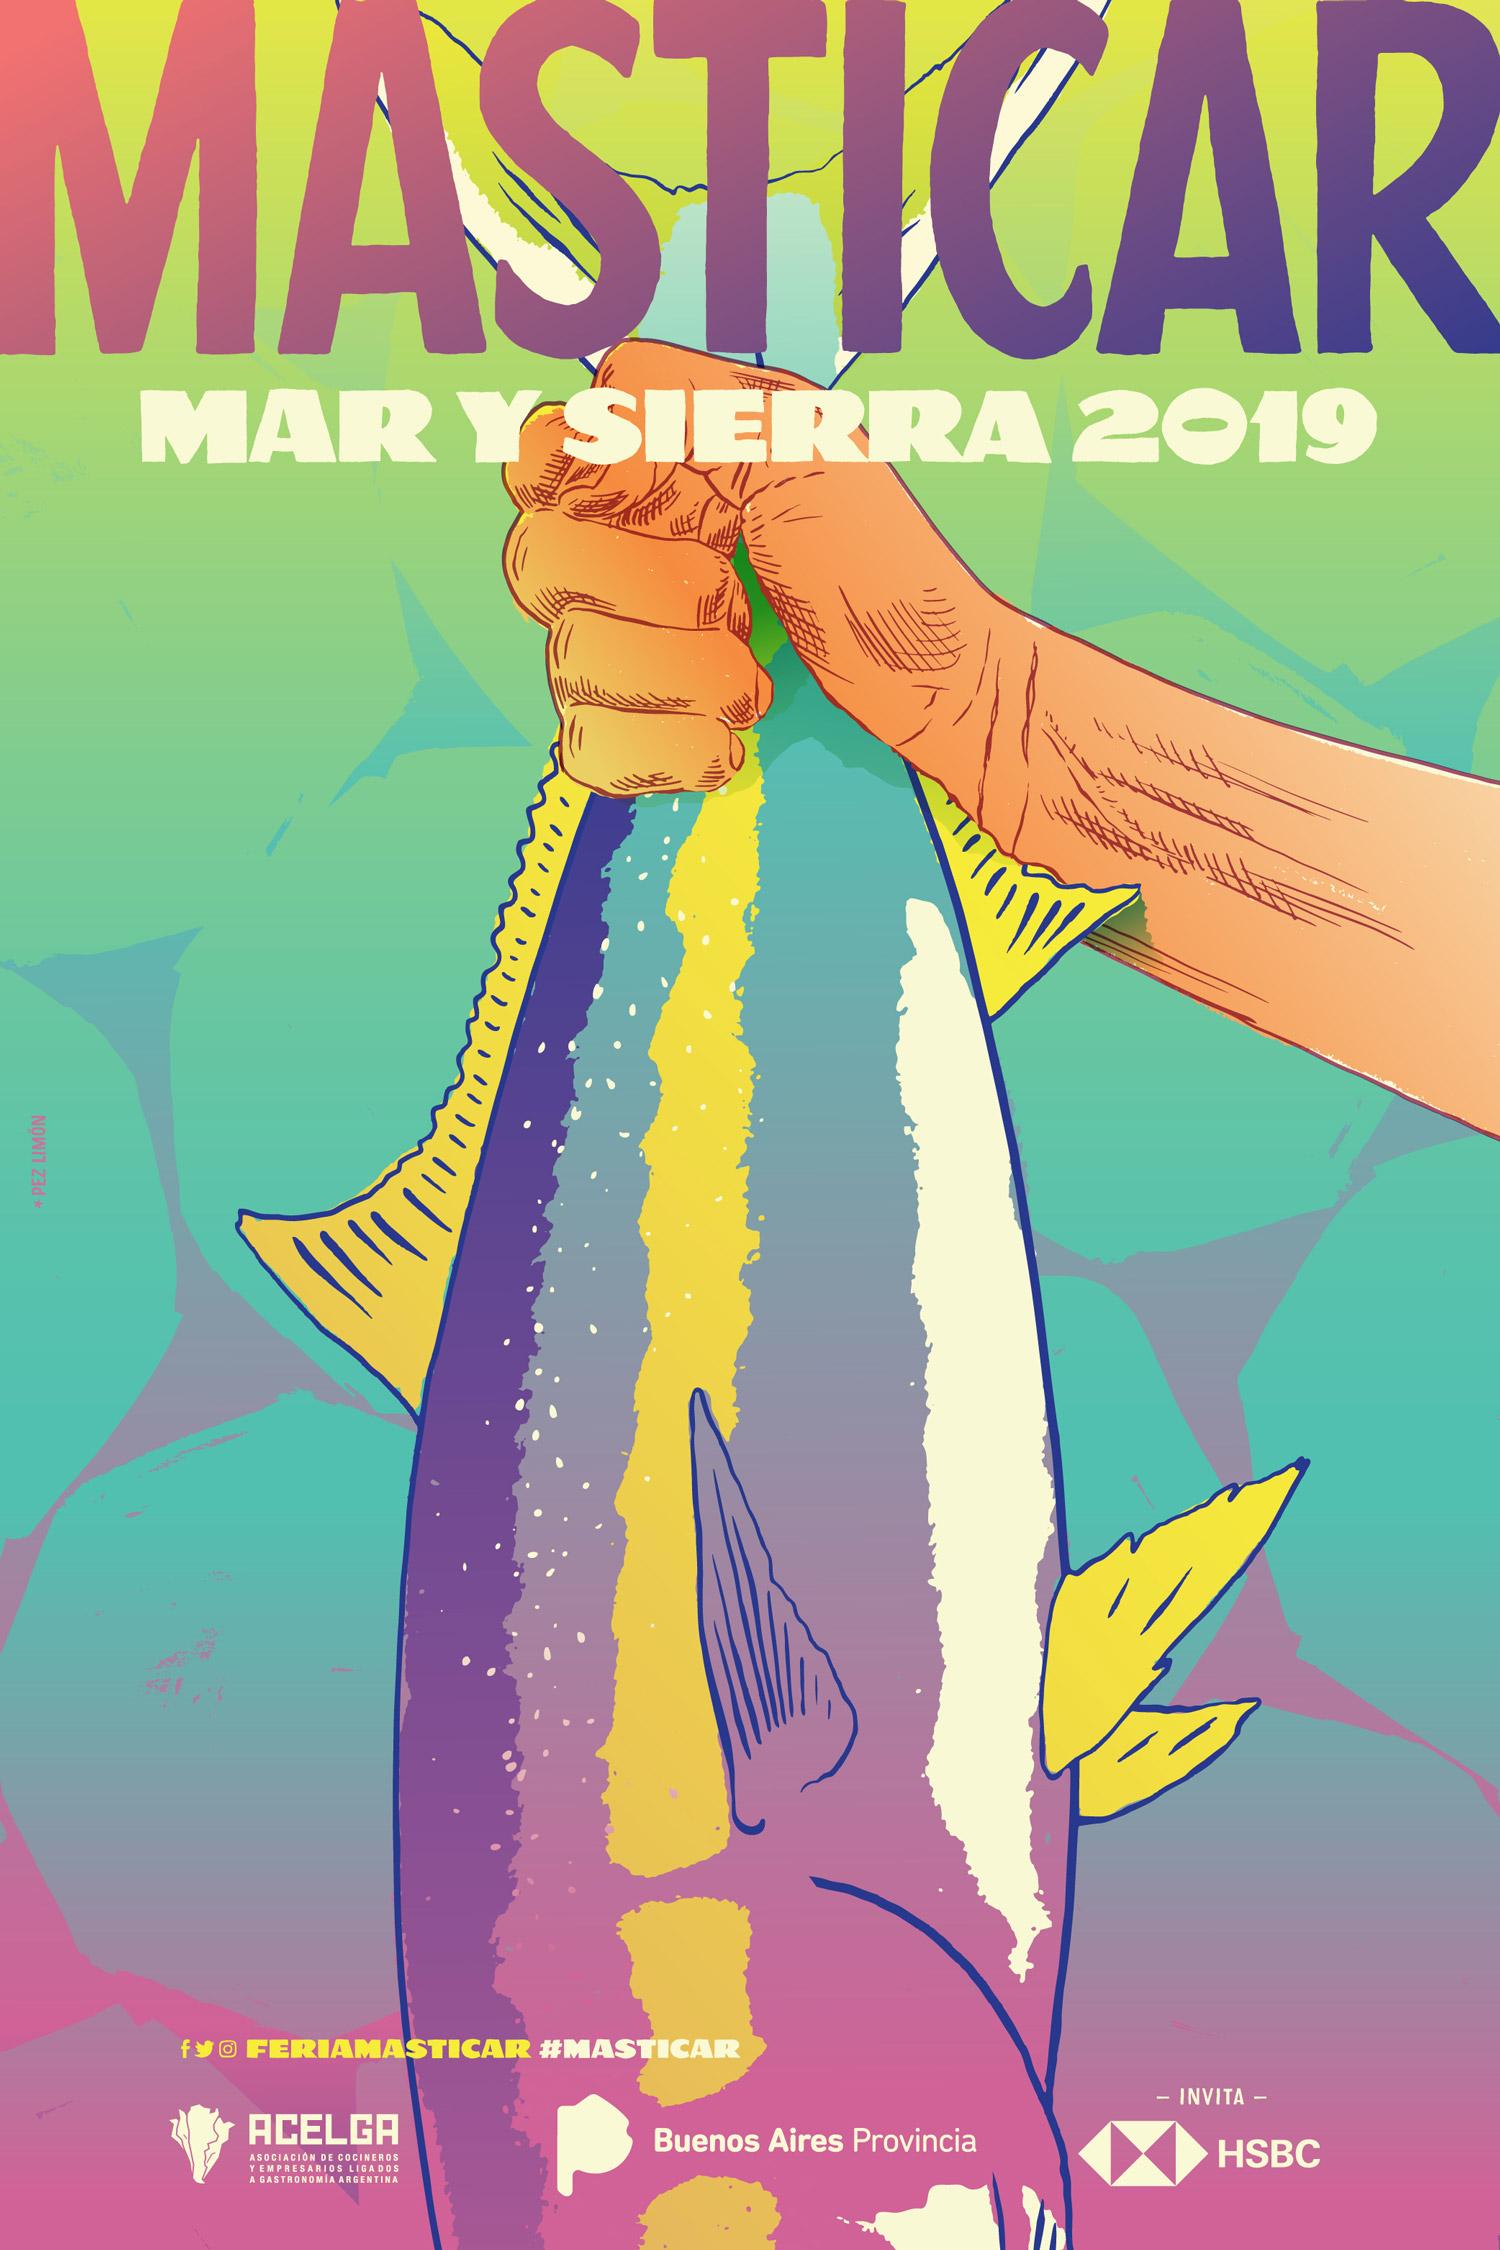 MASTICAR-Mar-y-Sierra-2019_Yanina-Arabena_Guillermo-Vizzari_05.jpg